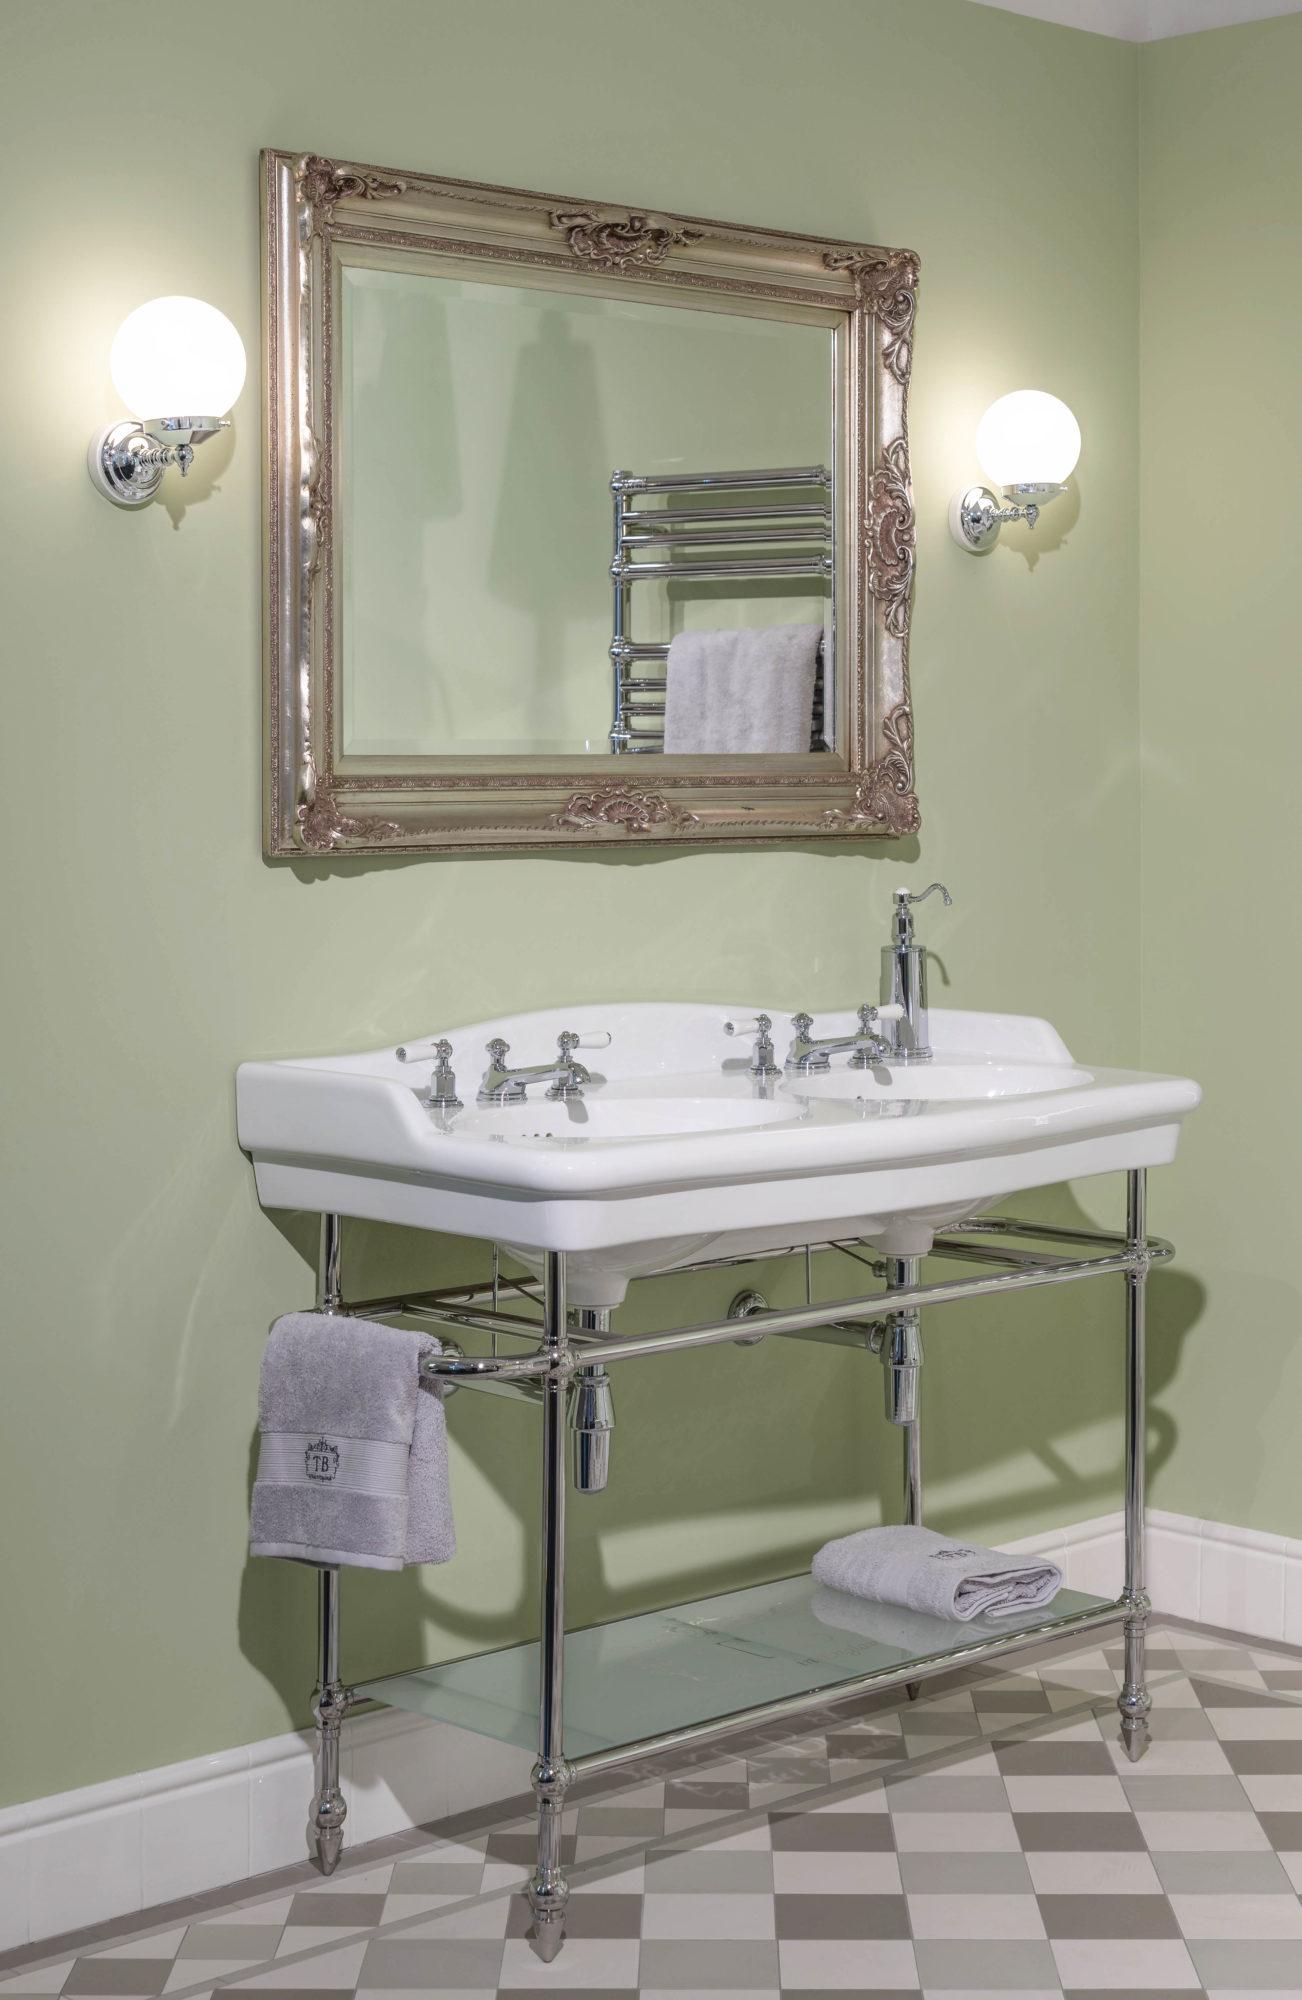 Helen konsolen waschtisch doppelt traditional bathrooms for Waschtisch doppelt